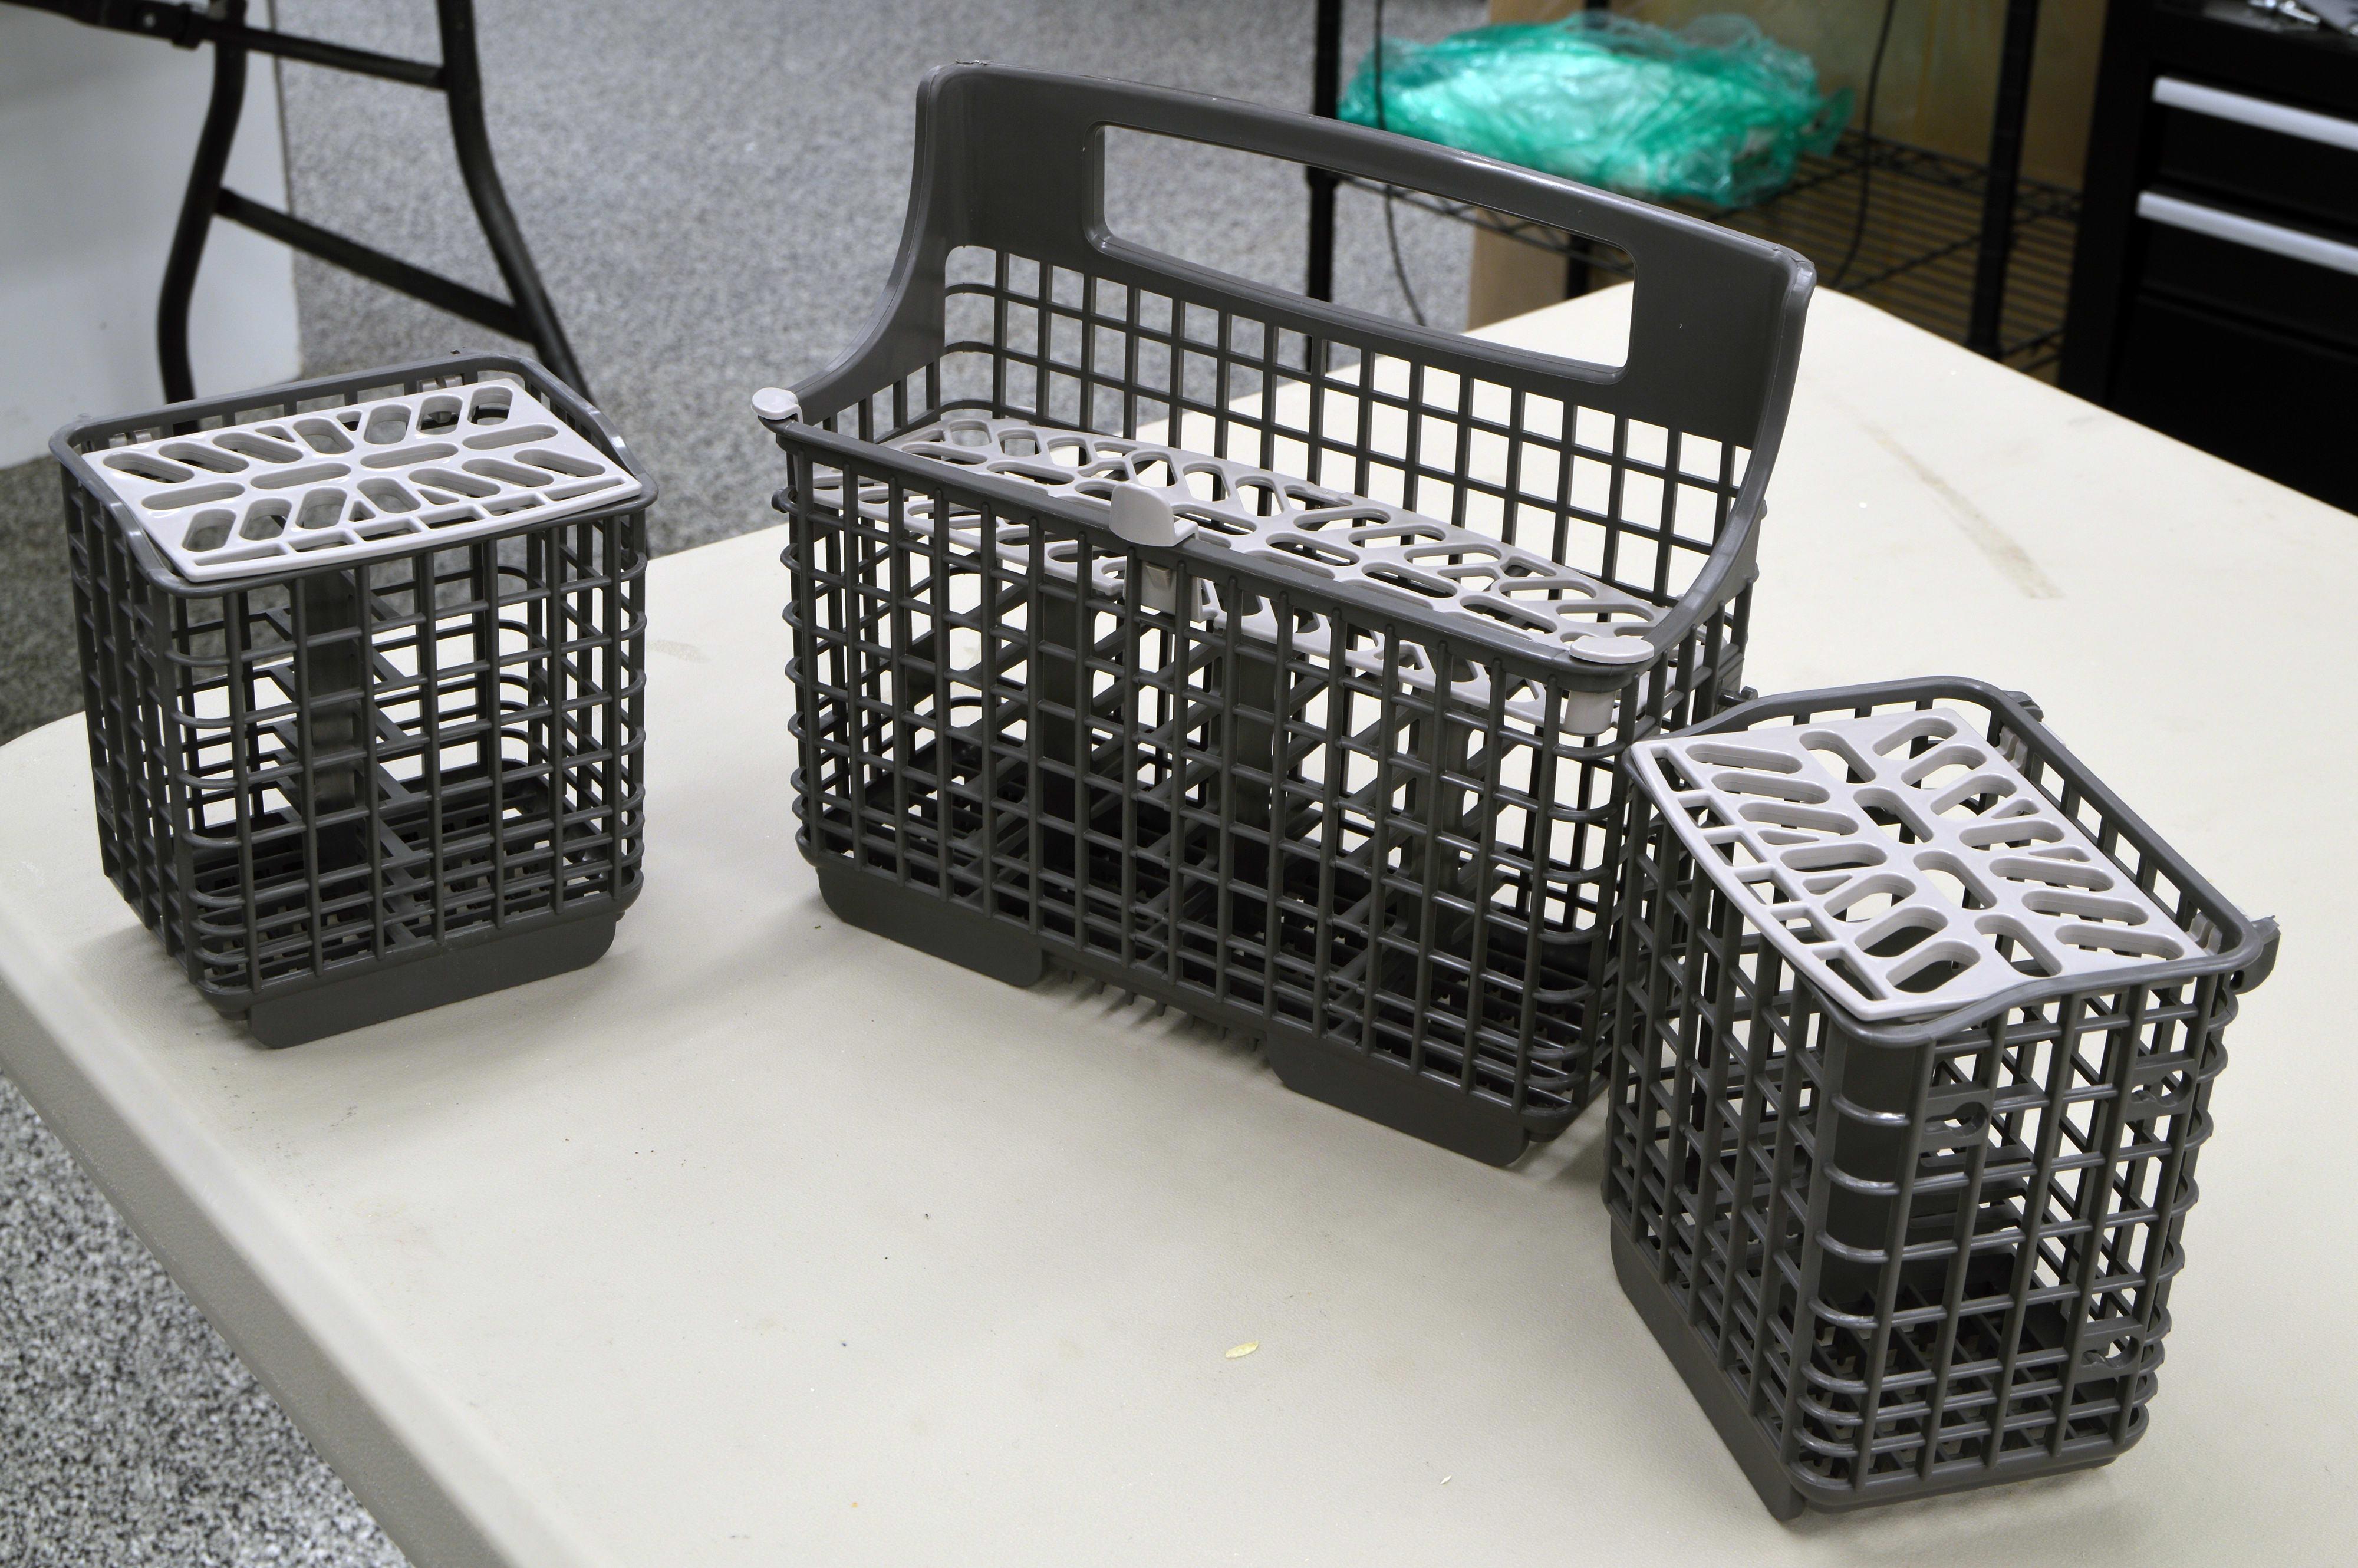 Cutlery basket split into three